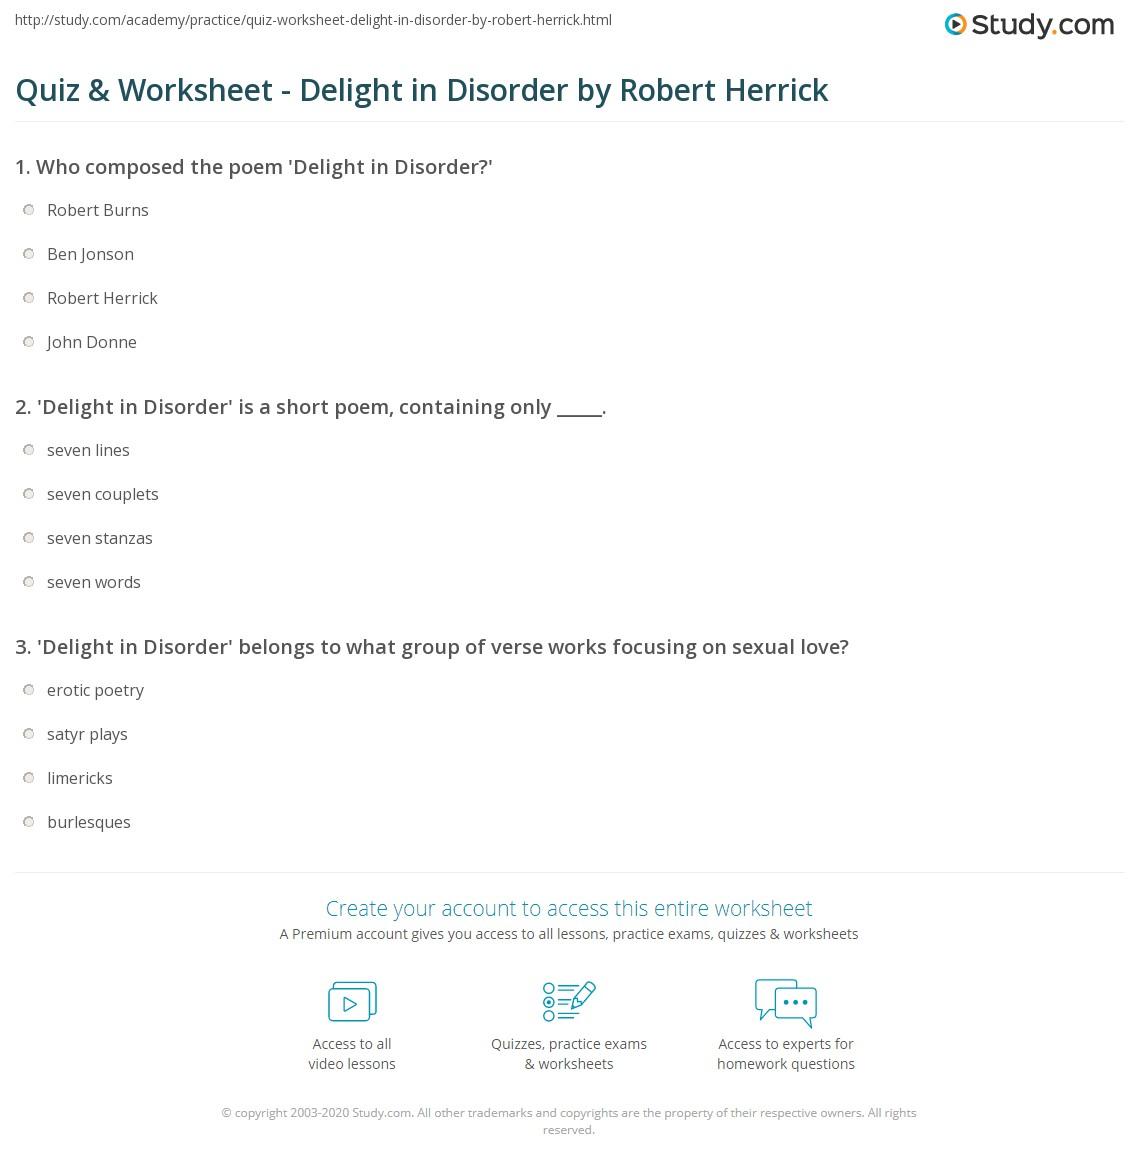 Robert Herrick delight in disorder summary